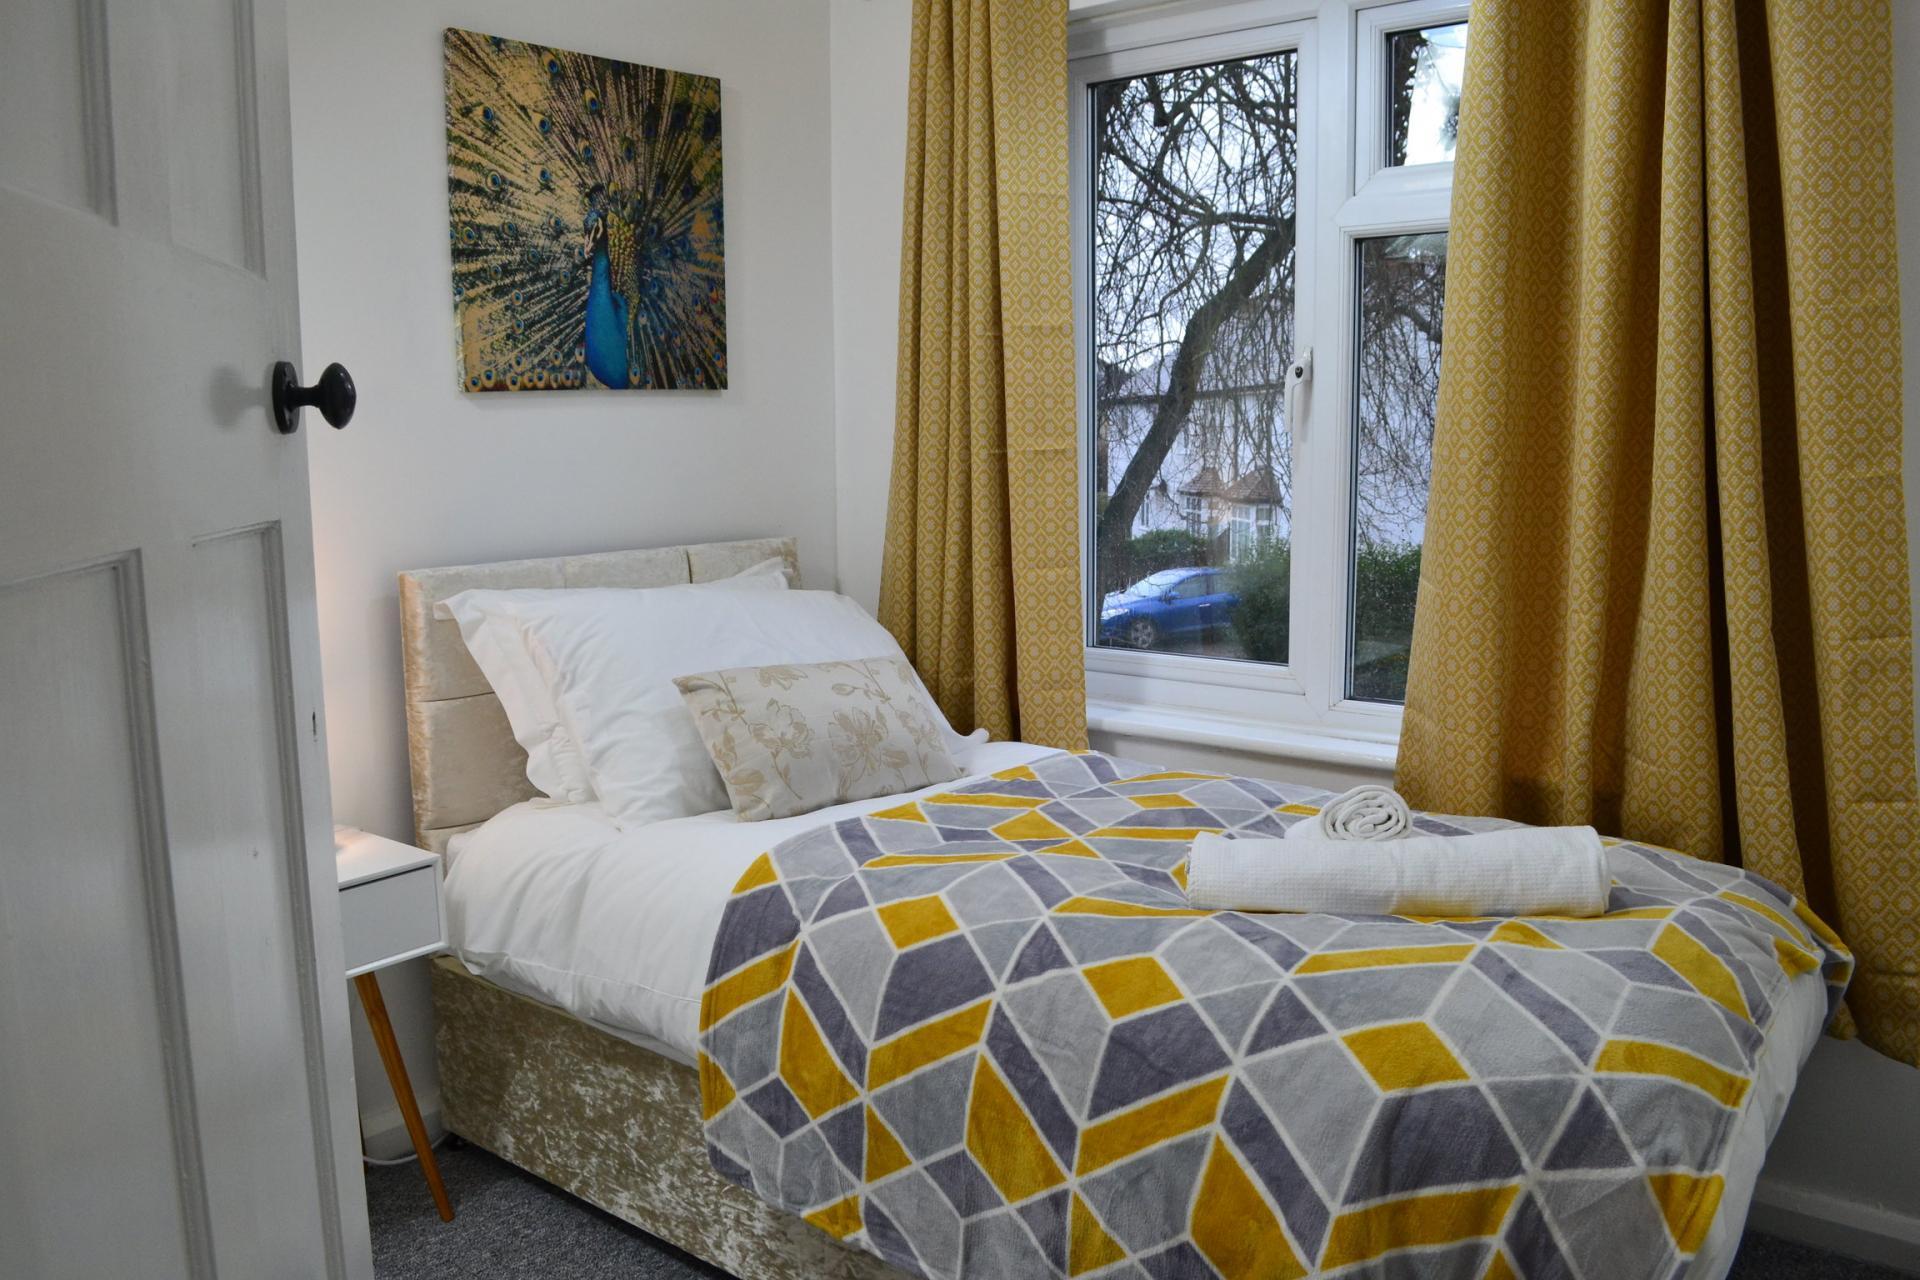 Single bed at Kendal Way Home, Chesterton, Cambridge - Citybase Apartments